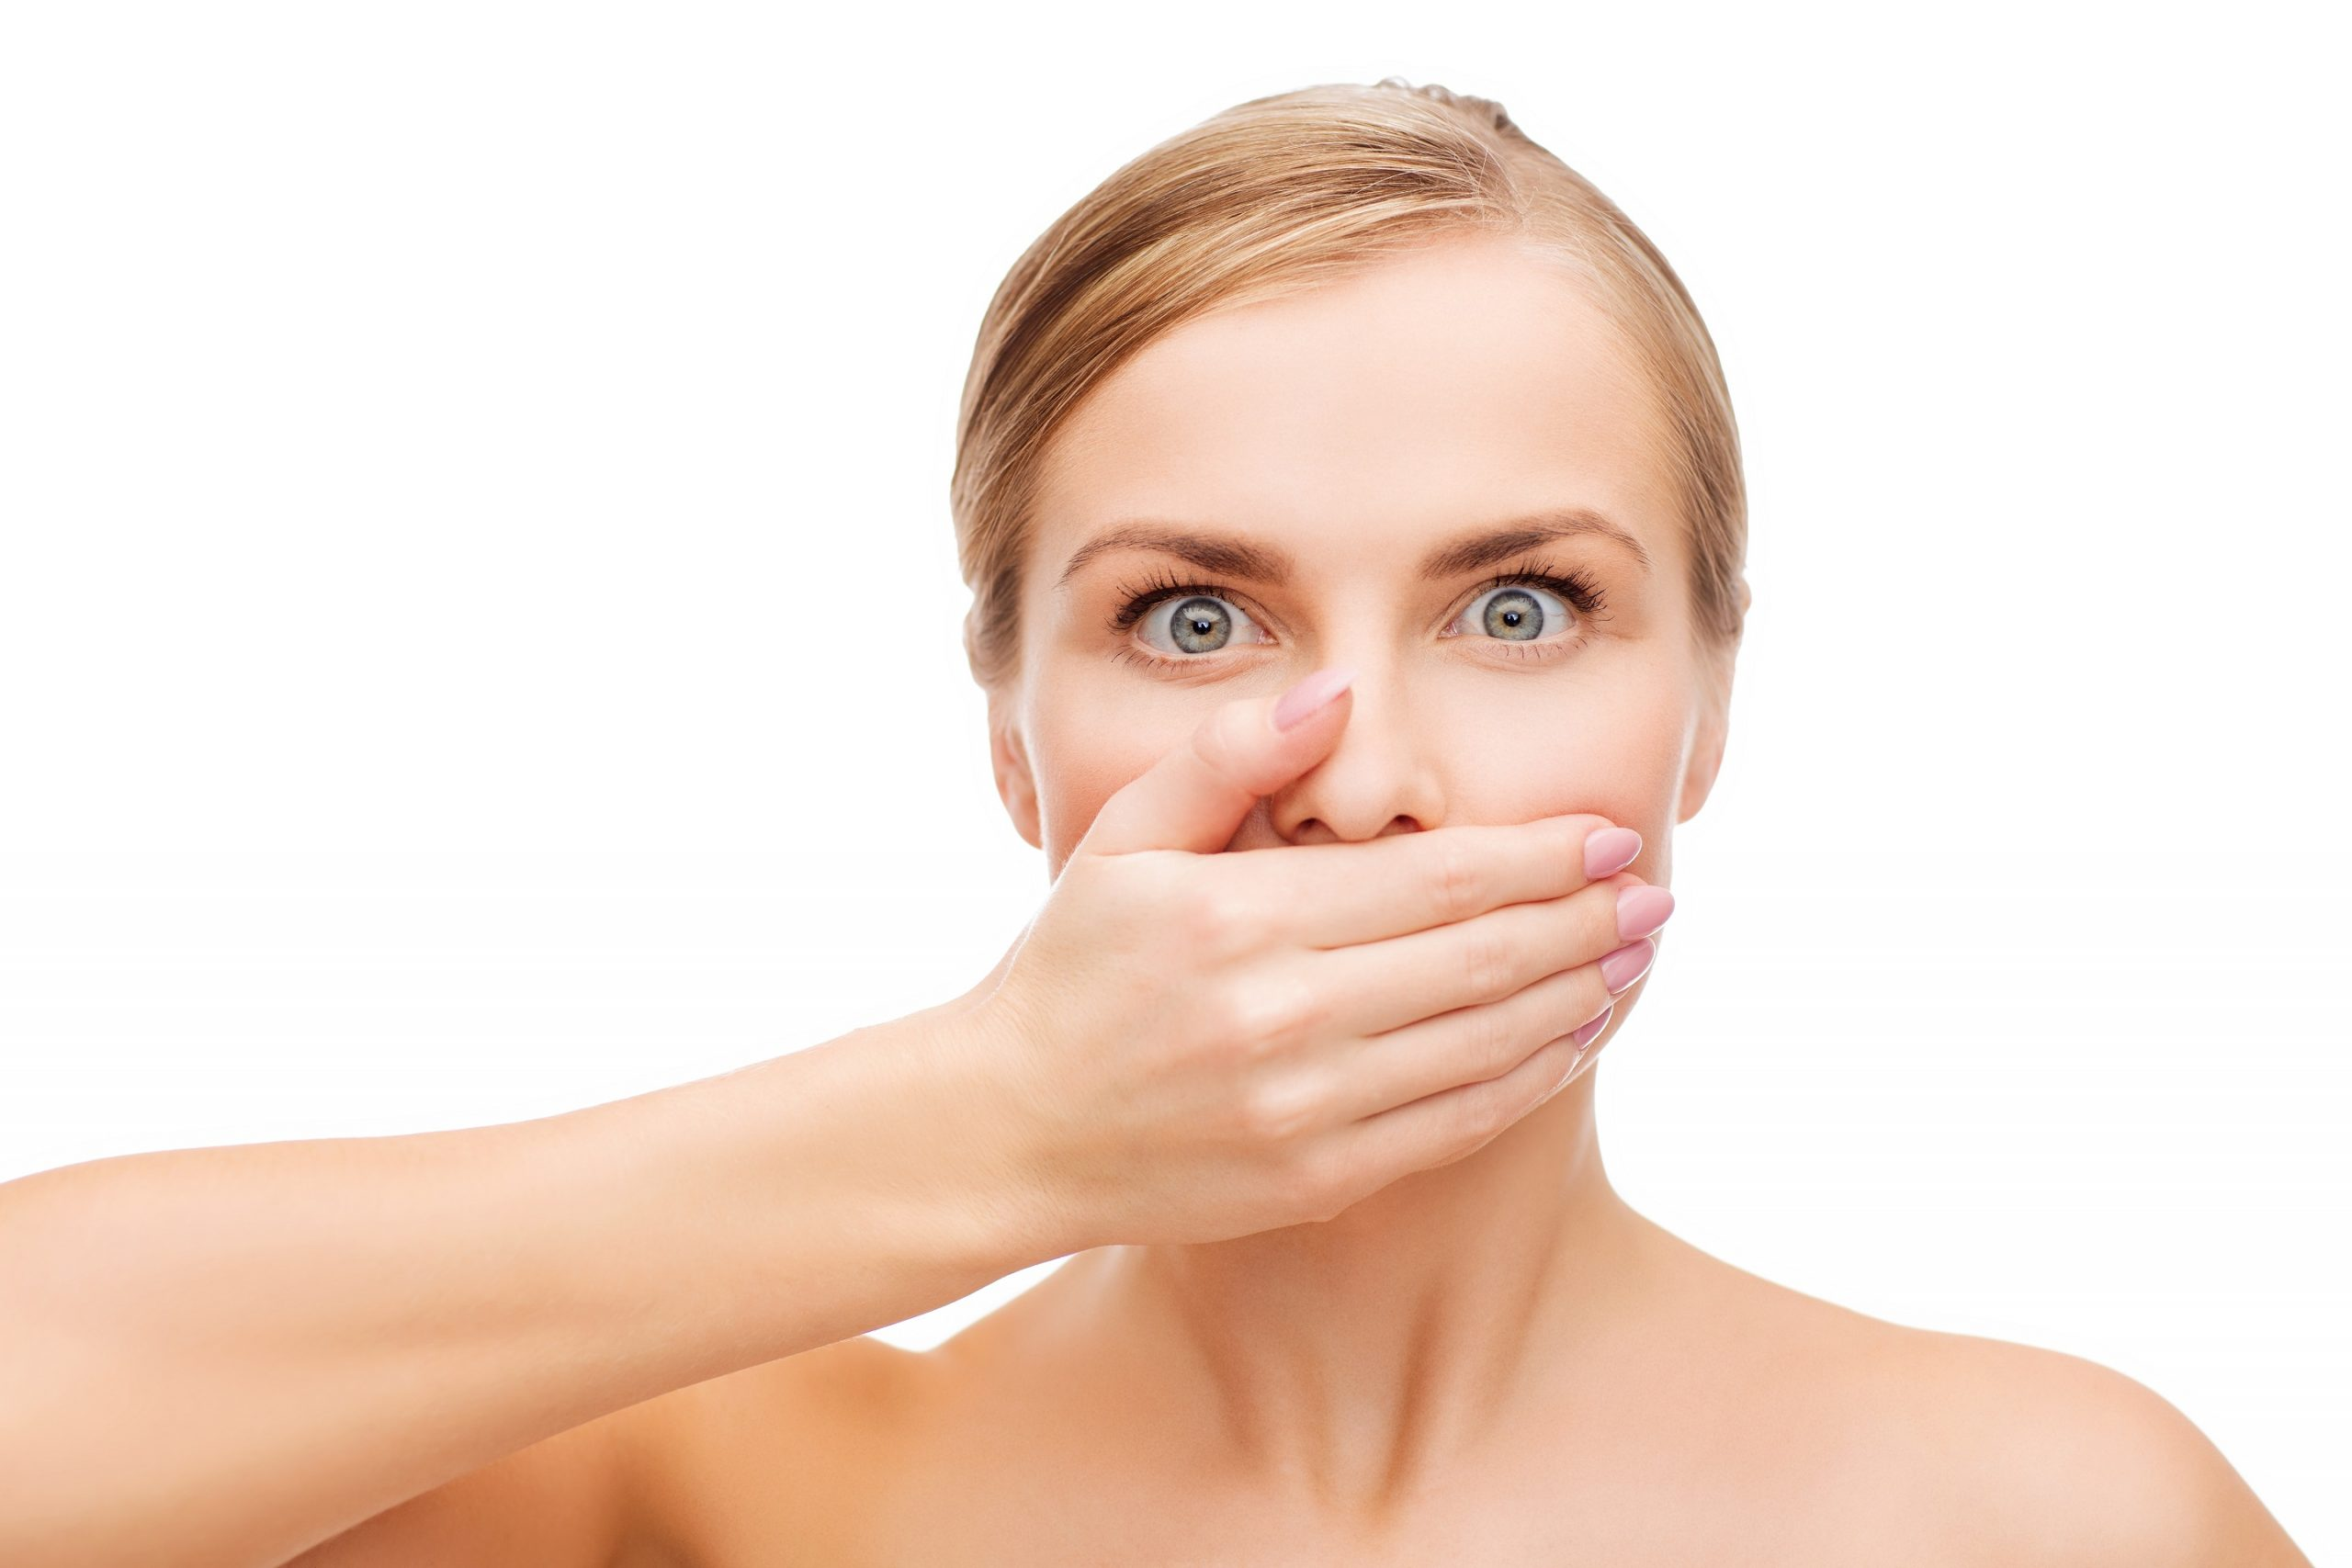 Evita paradontoza cu o igiena orala corecta!